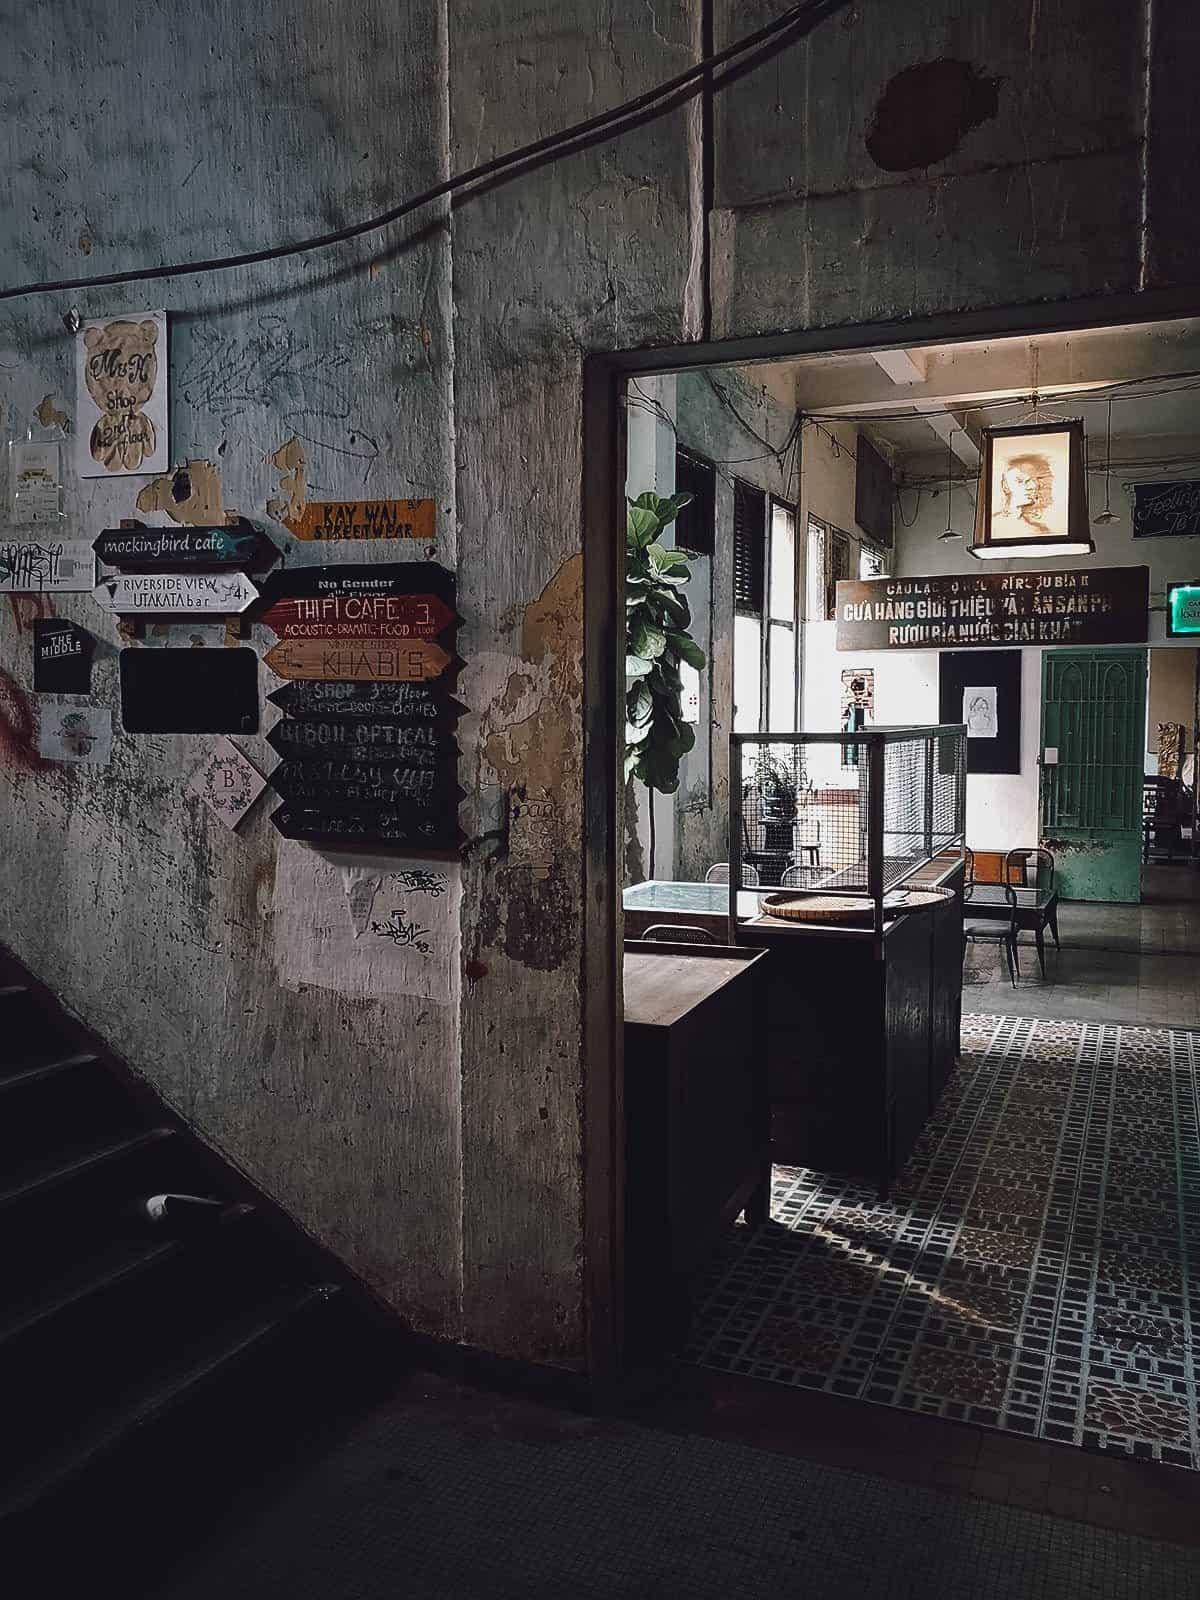 Hallway to Hoang Thi Cafe